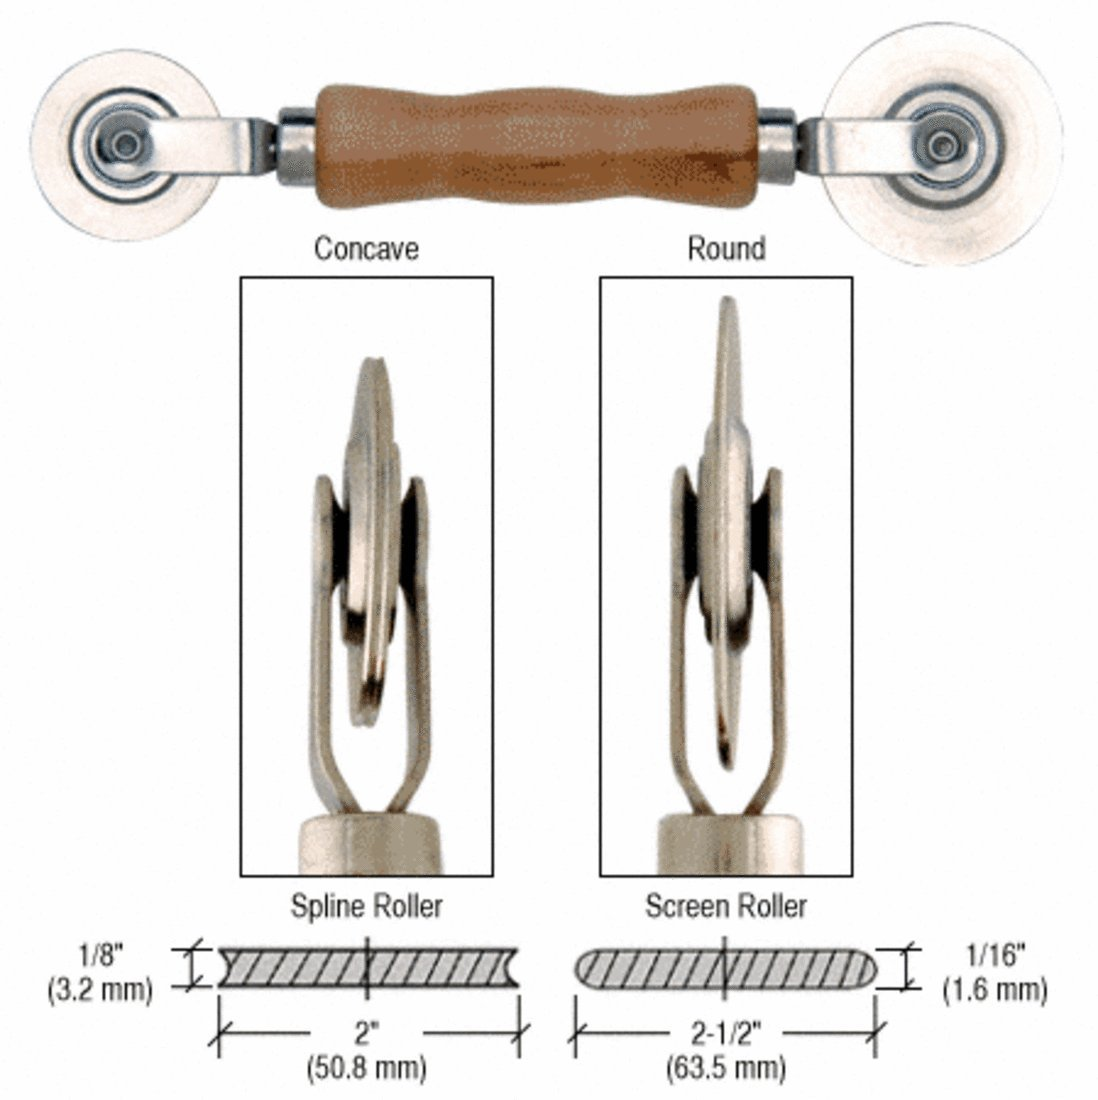 CRL Heavy-Duty Steel Combination Roller Tool 2-1/2'' x 1/16'' and 2'' x 1/8'' Wheels